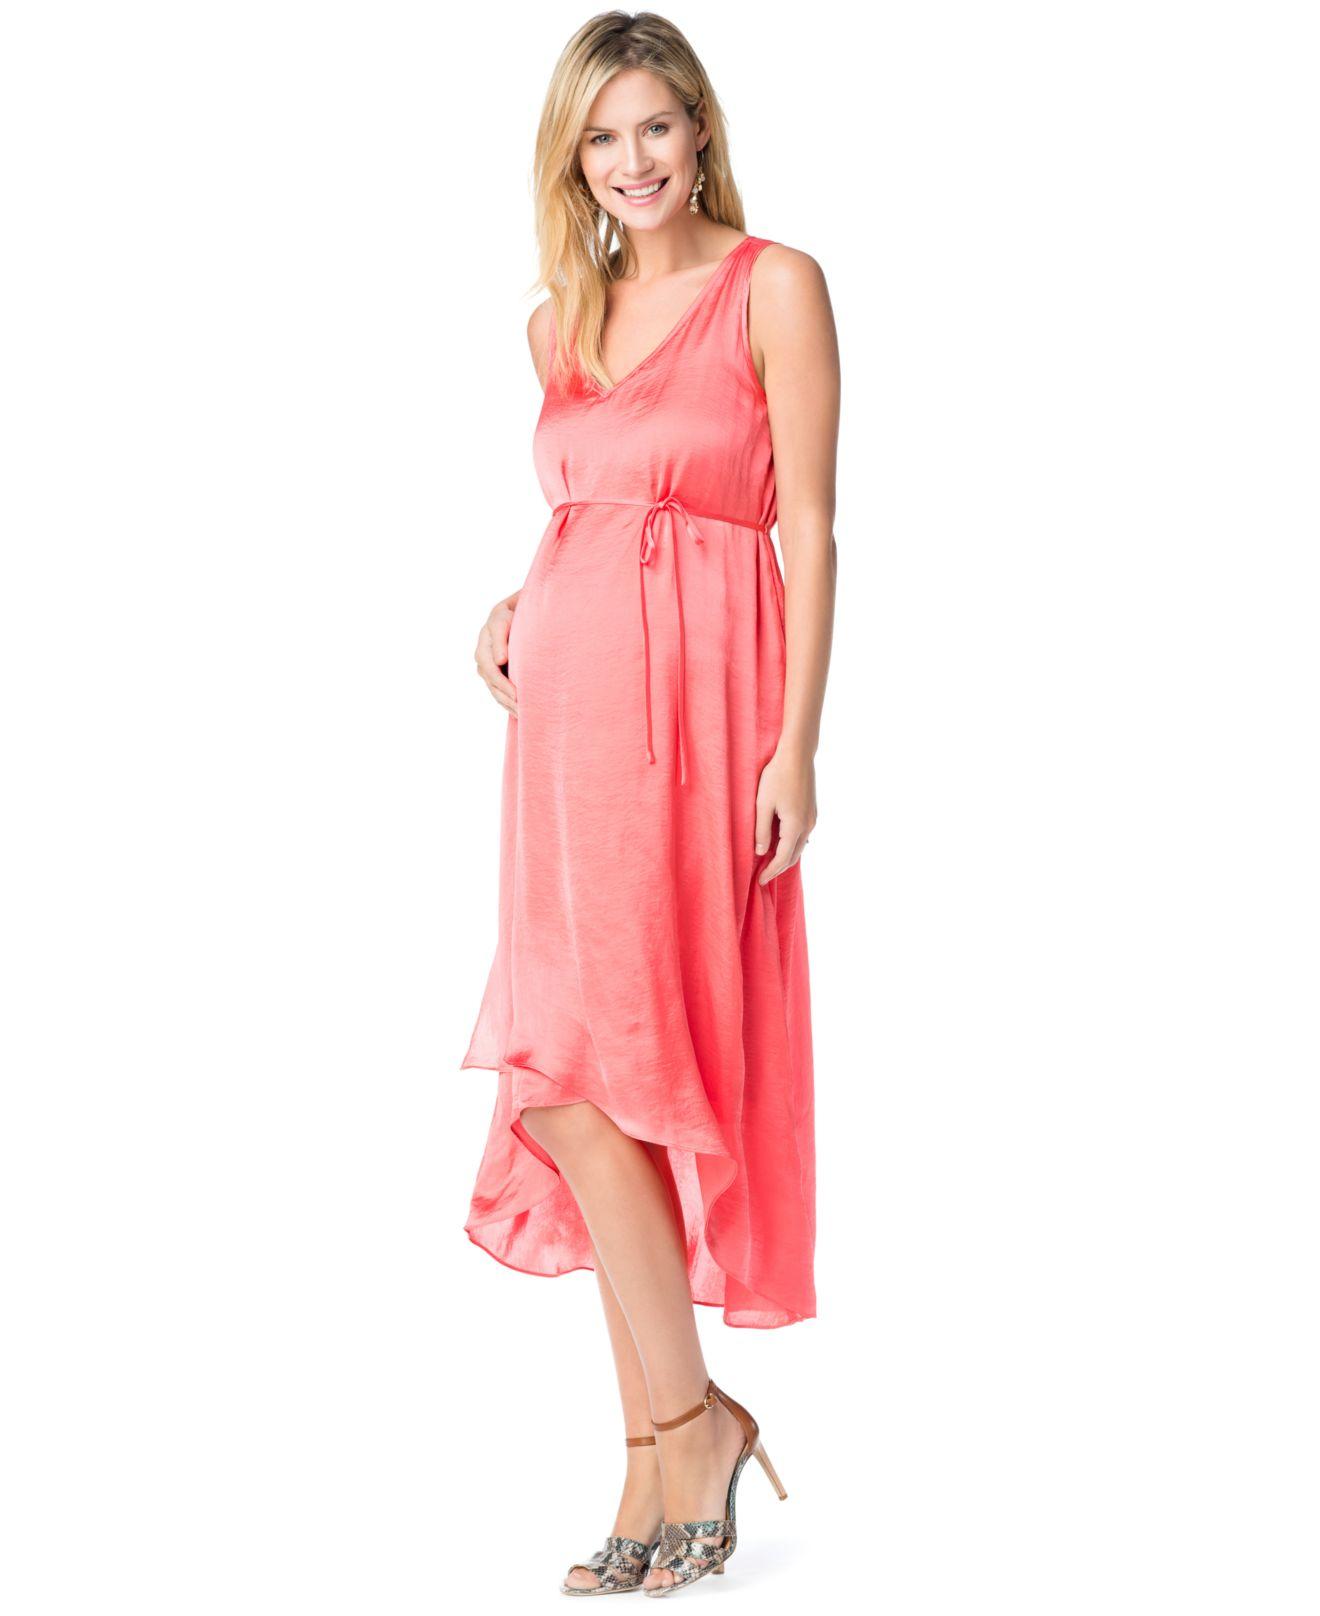 859982ae43b3 Jessica Simpson Maternity Sleeveless High-Low Maternity Maxi Dress ...